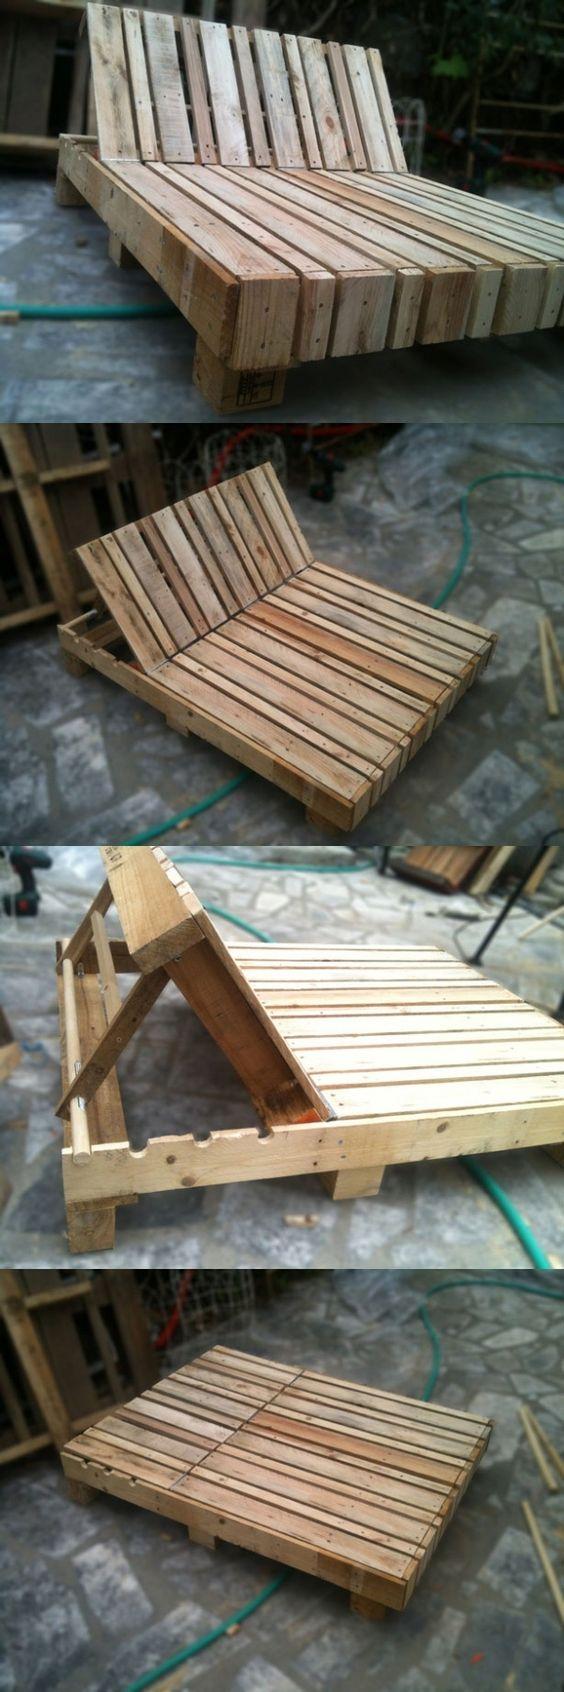 madeira, pallet, cadeira, espreguiçadeira